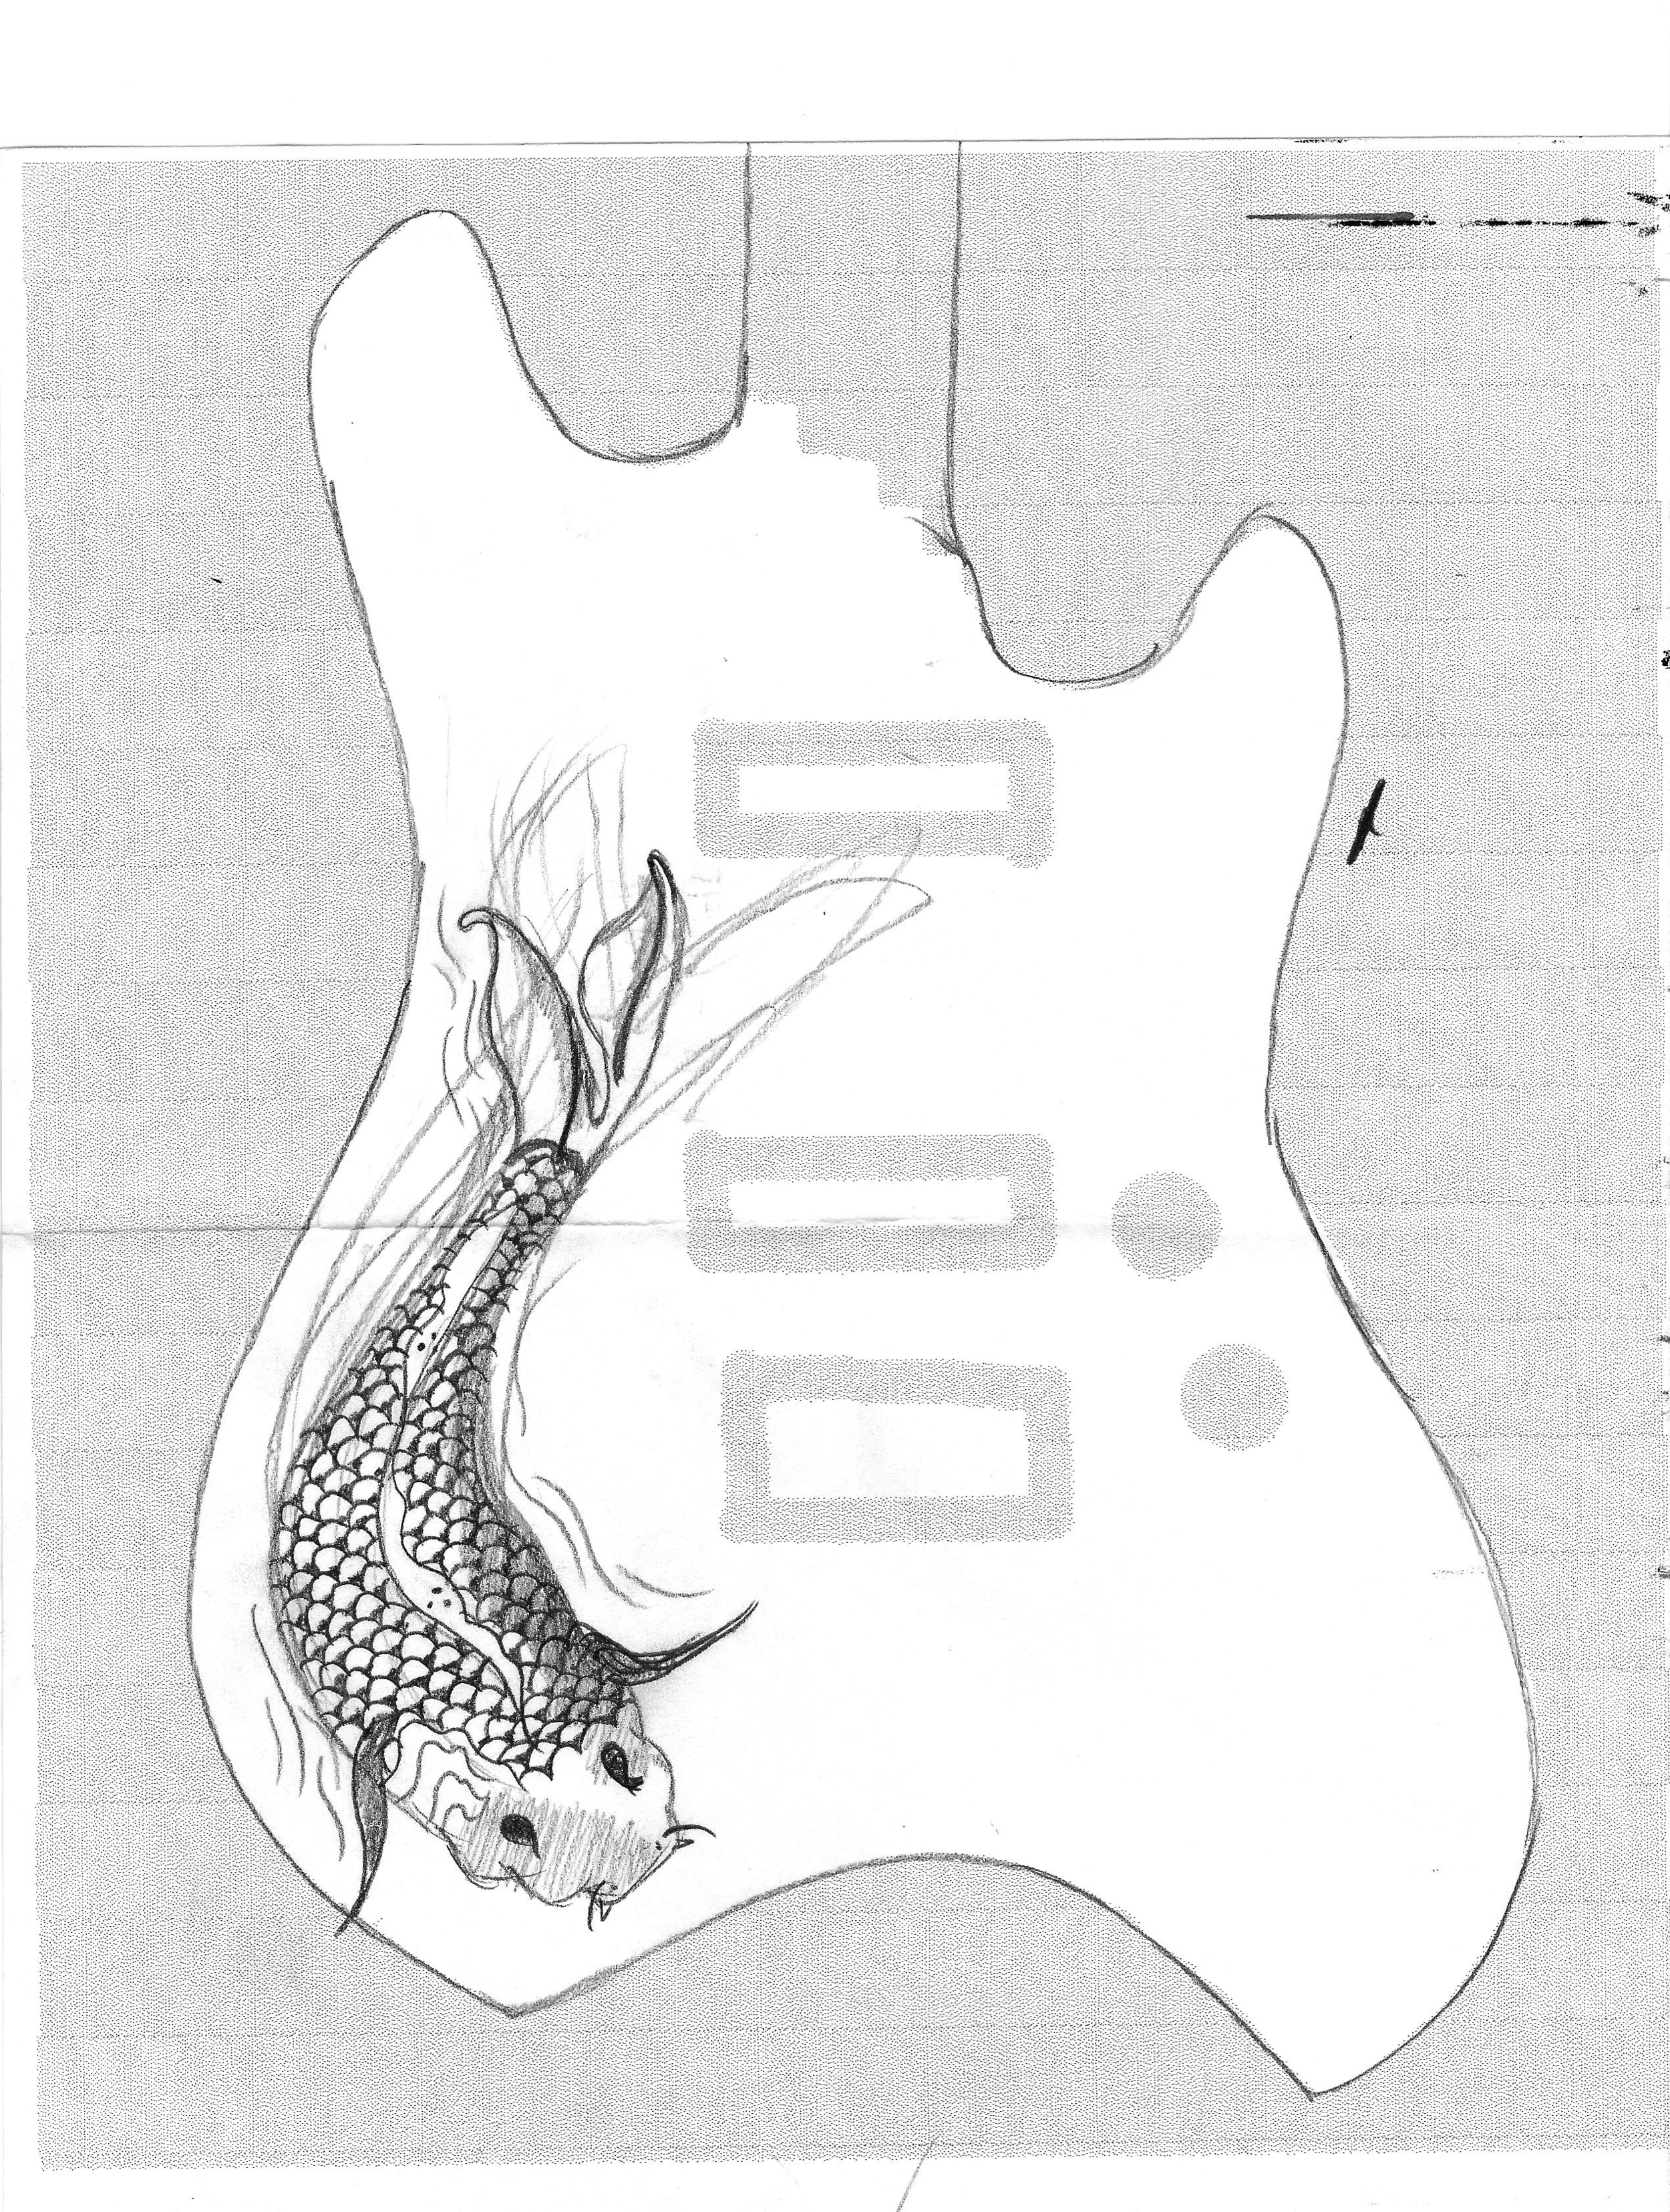 guitar sketch 1